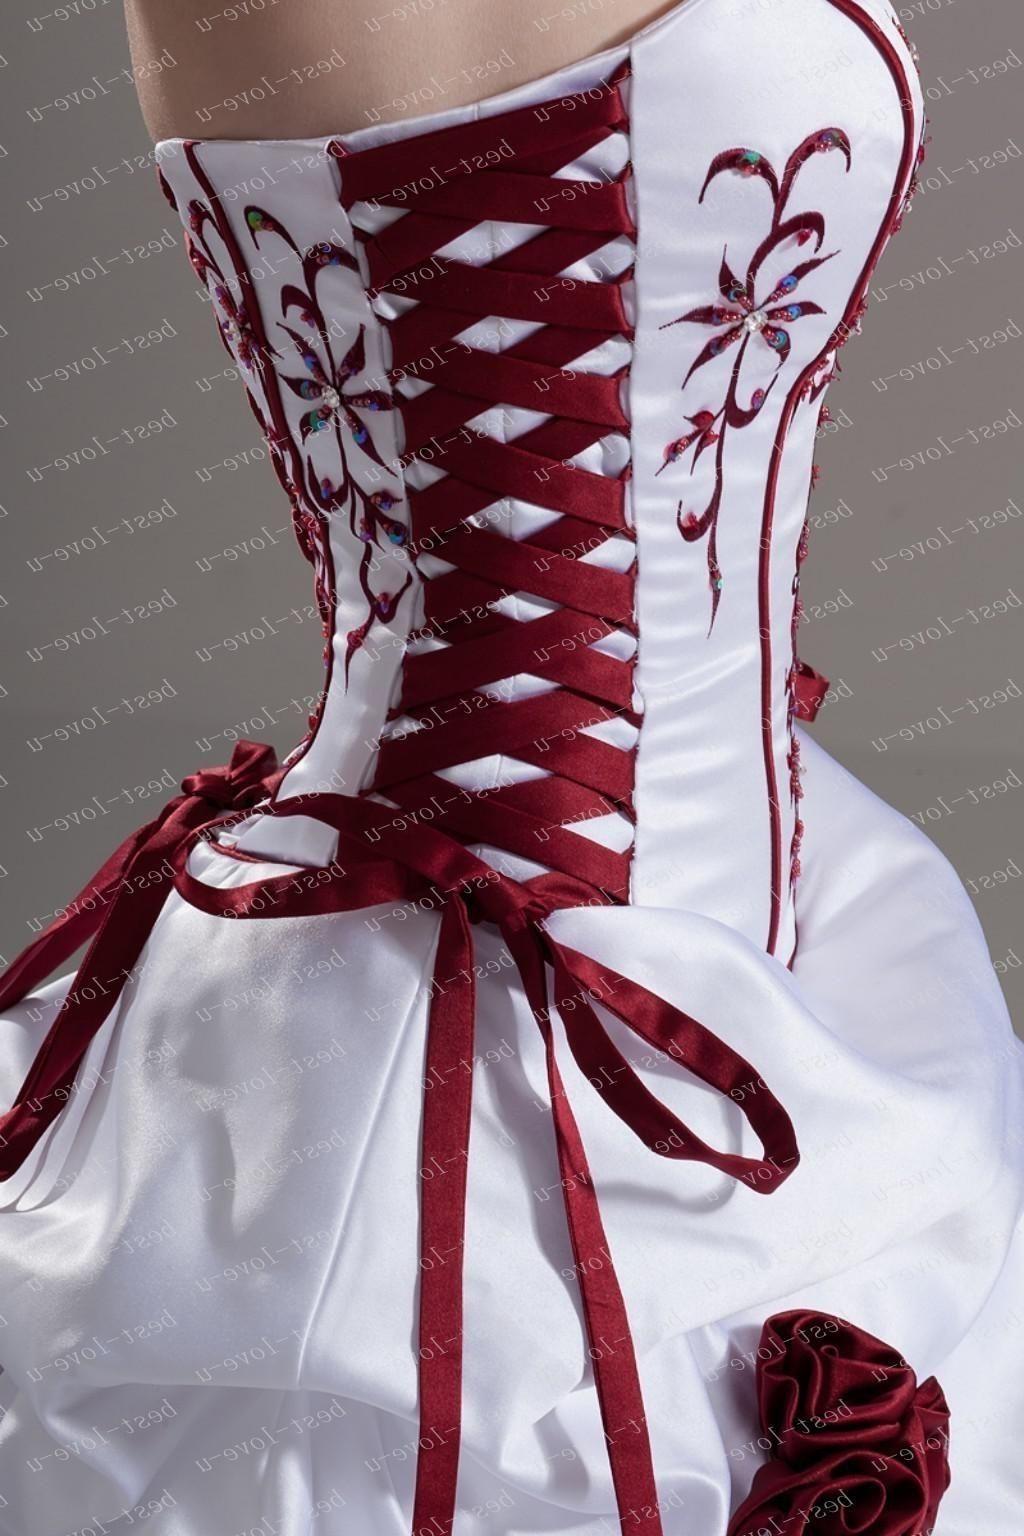 Burgundy And White Wedding Dress Wedding Dresses Corset Red Wedding Dresses Winter Wedding Dress